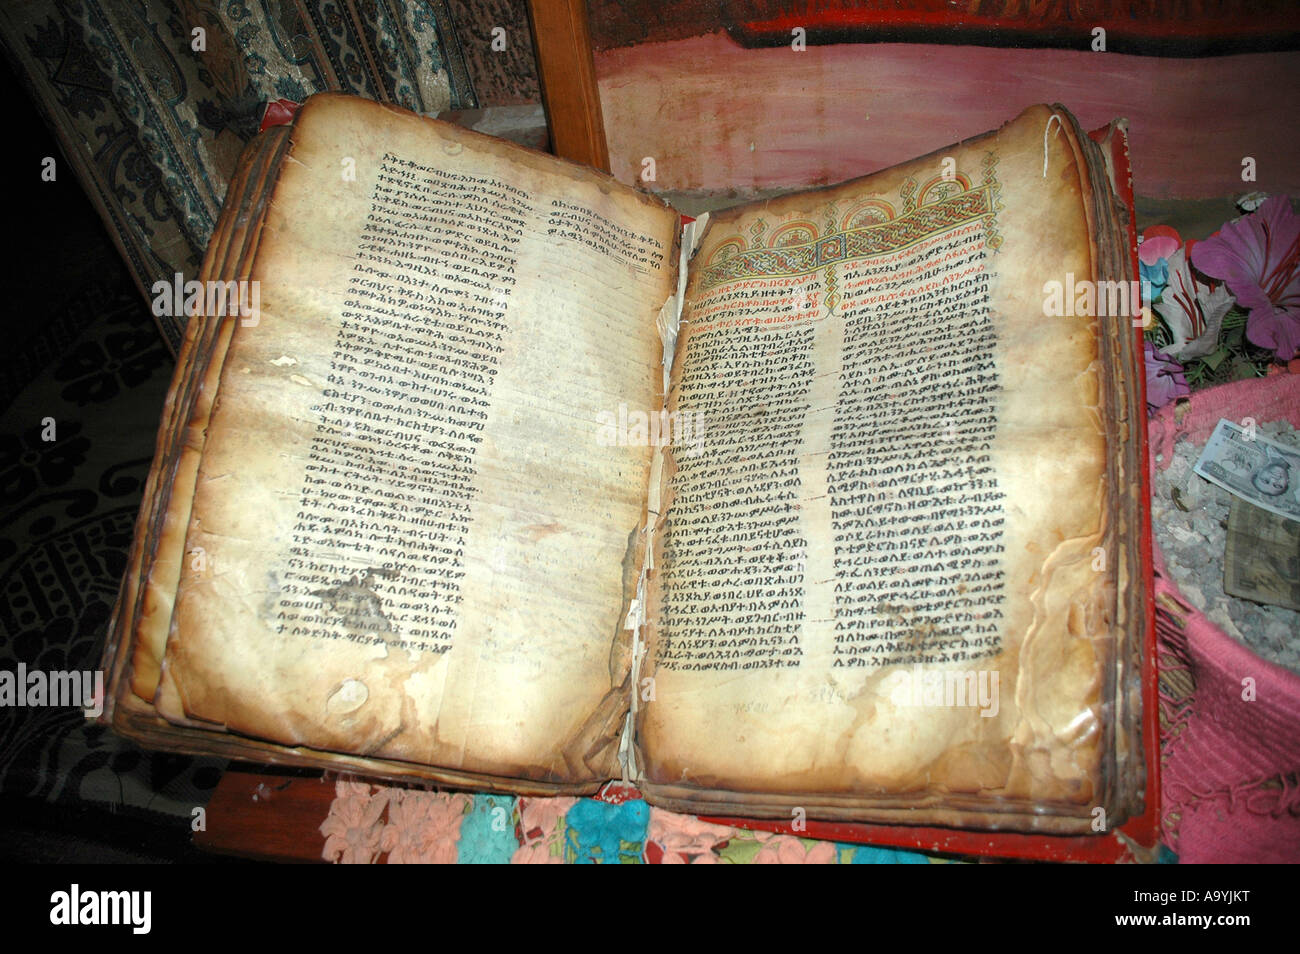 Old book of the bible written in Amharic script in rock hewn church Lalibela Ethiopia Stock Photo